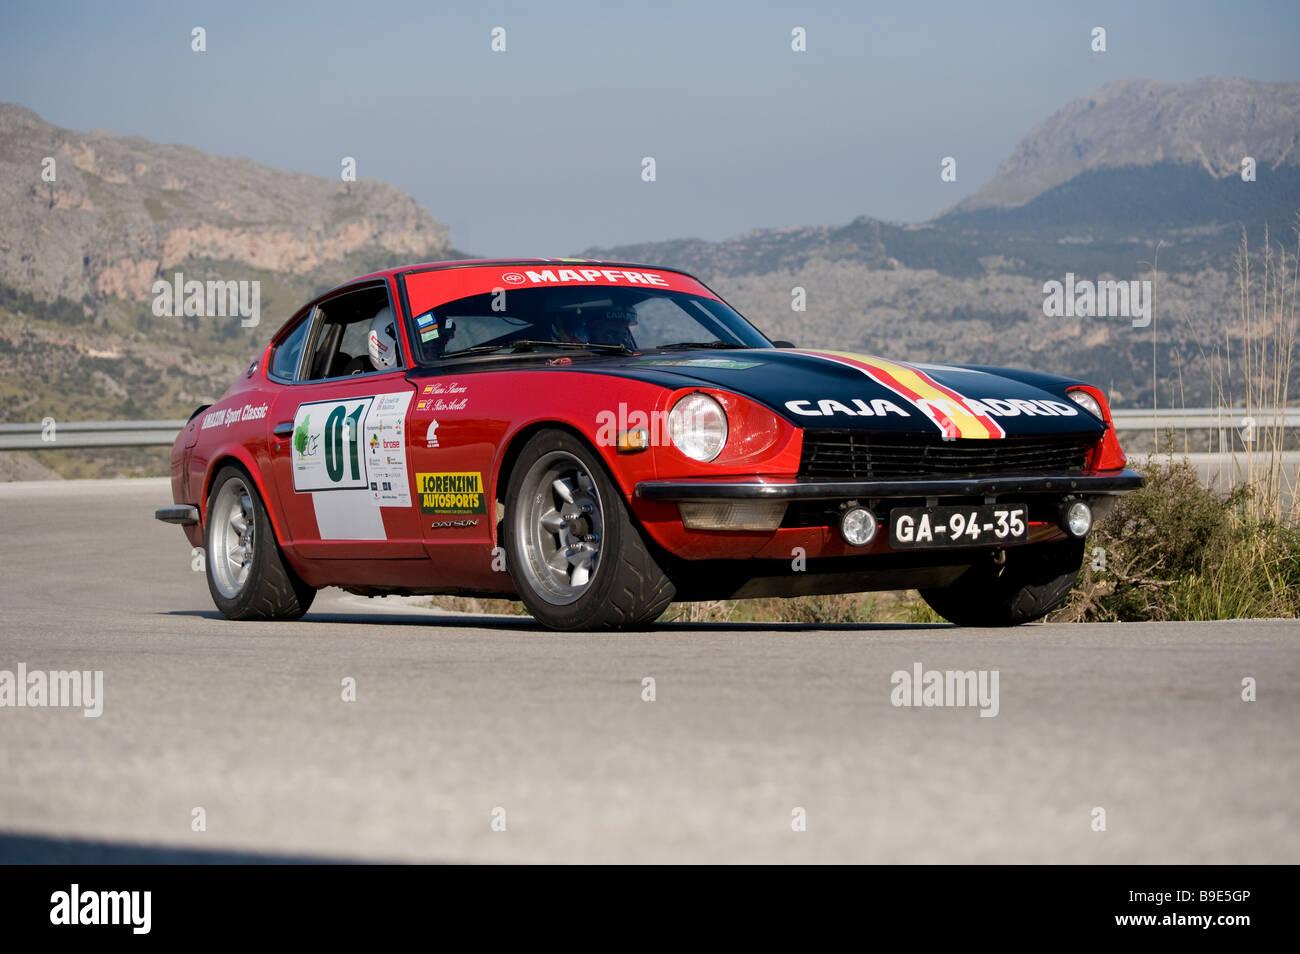 Datsun 240z stock photos datsun 240z stock images alamy red 1970 datsun 240z racing in the classic car rally mallorca stock image vanachro Gallery